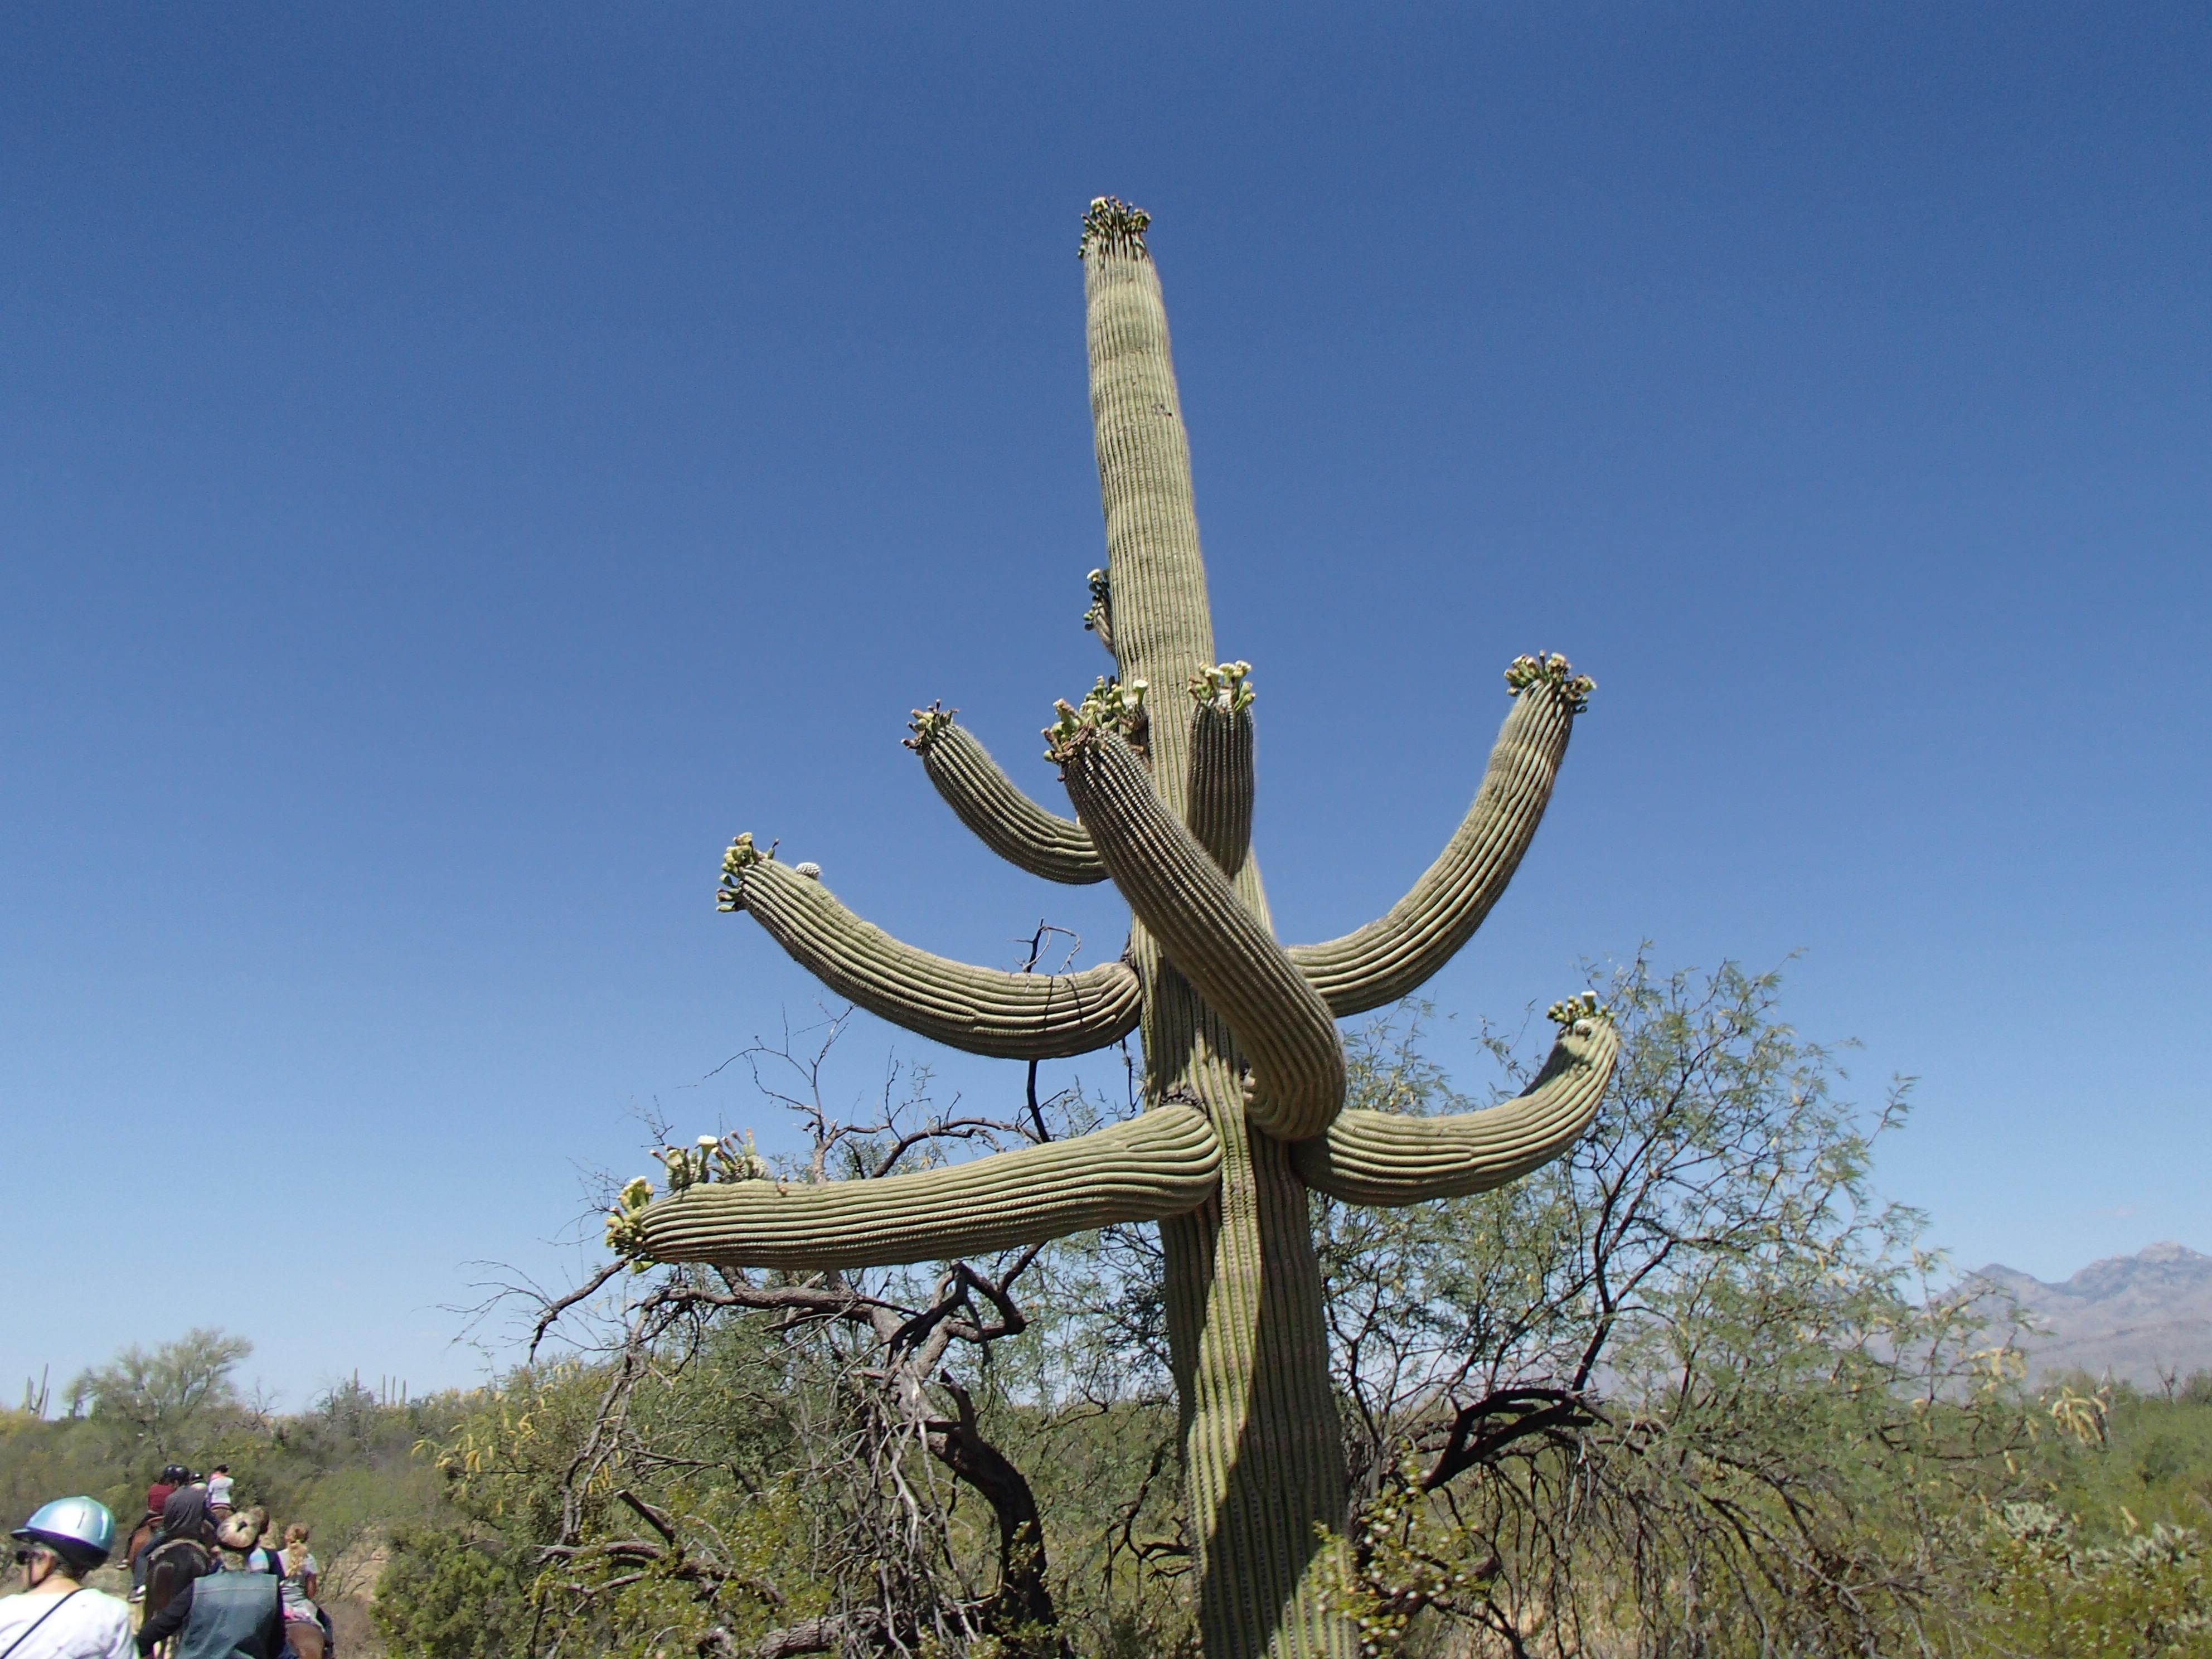 Plants of the Sonoran Desert | Elaine A Powers, Author